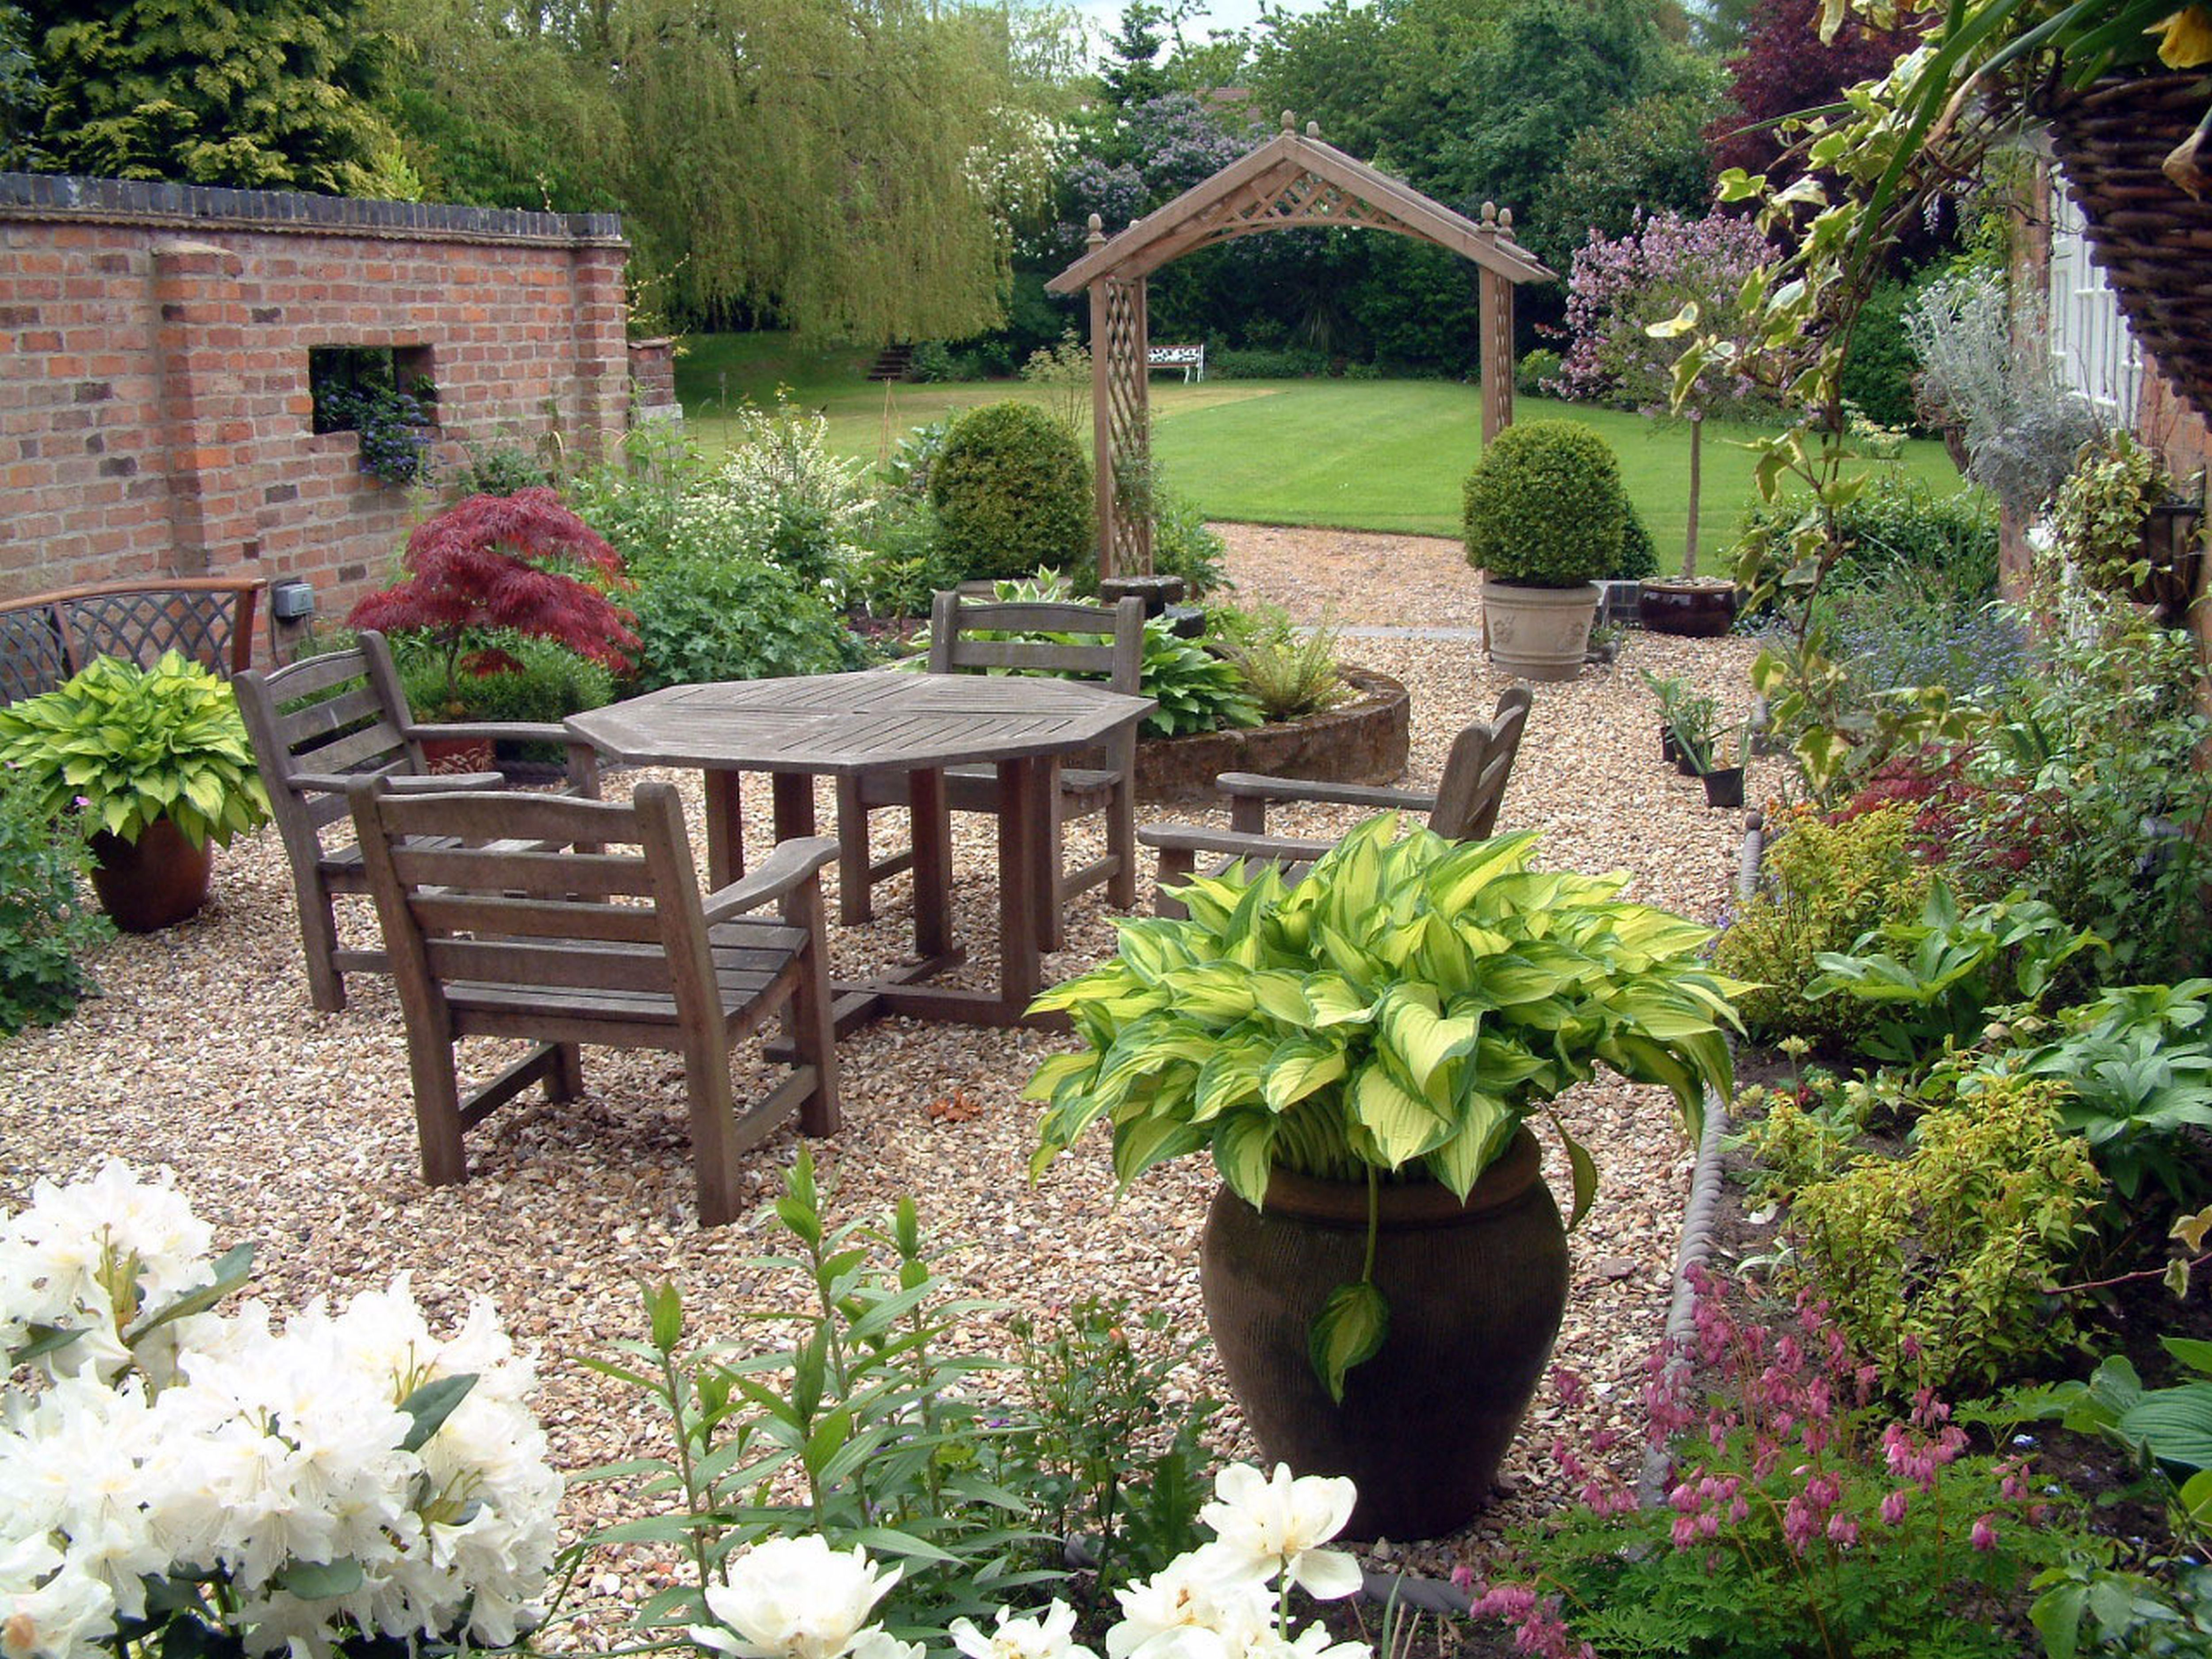 ingenious landscape ideas on a budget. Garden ideas urban backyard designs  Google Search Secret Gardens